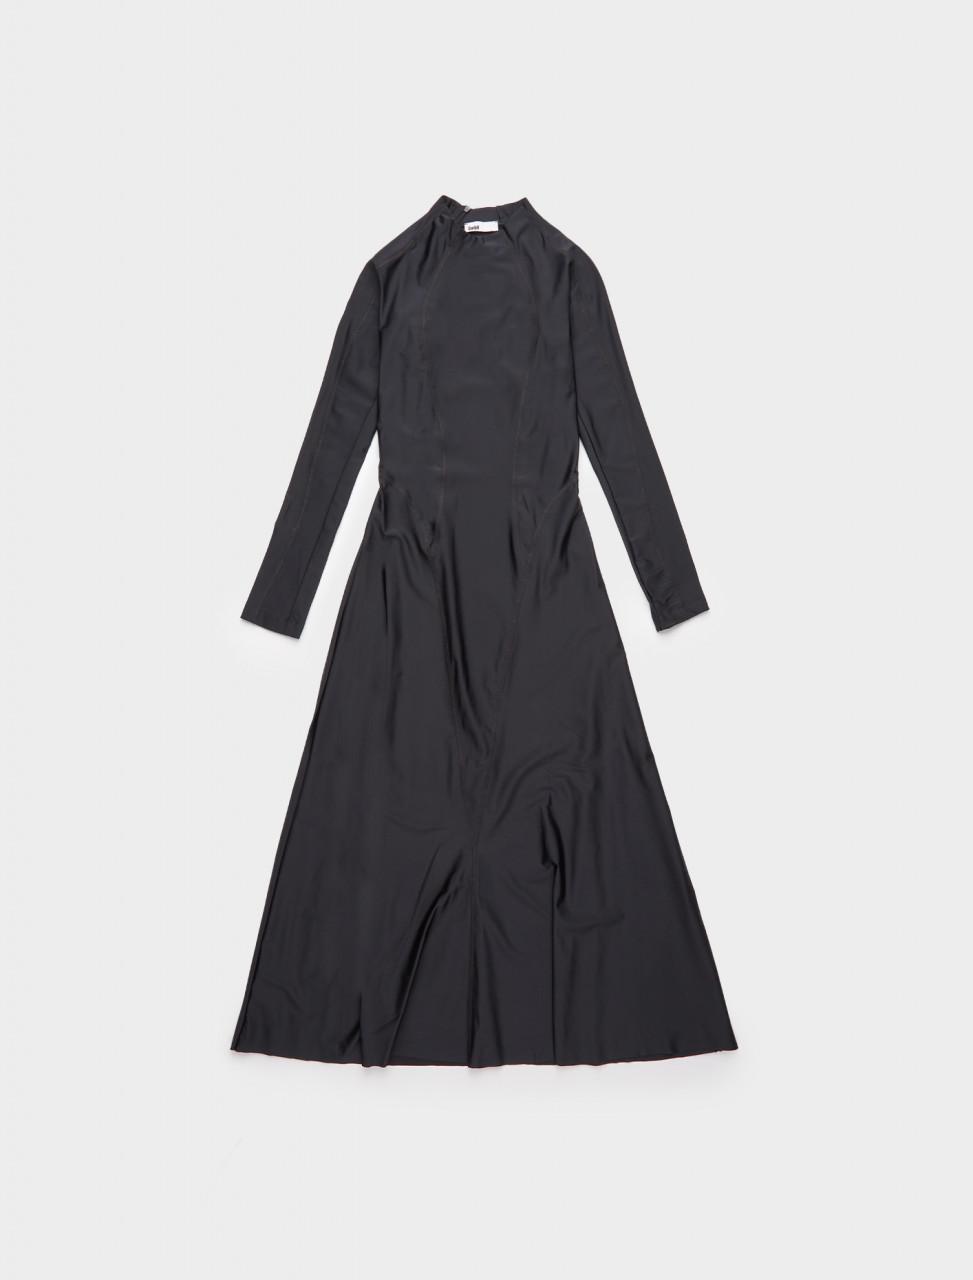 226-ELIF-AW20 GMBH ELIF LONG SLEEVE DRESS BLACK WHITE